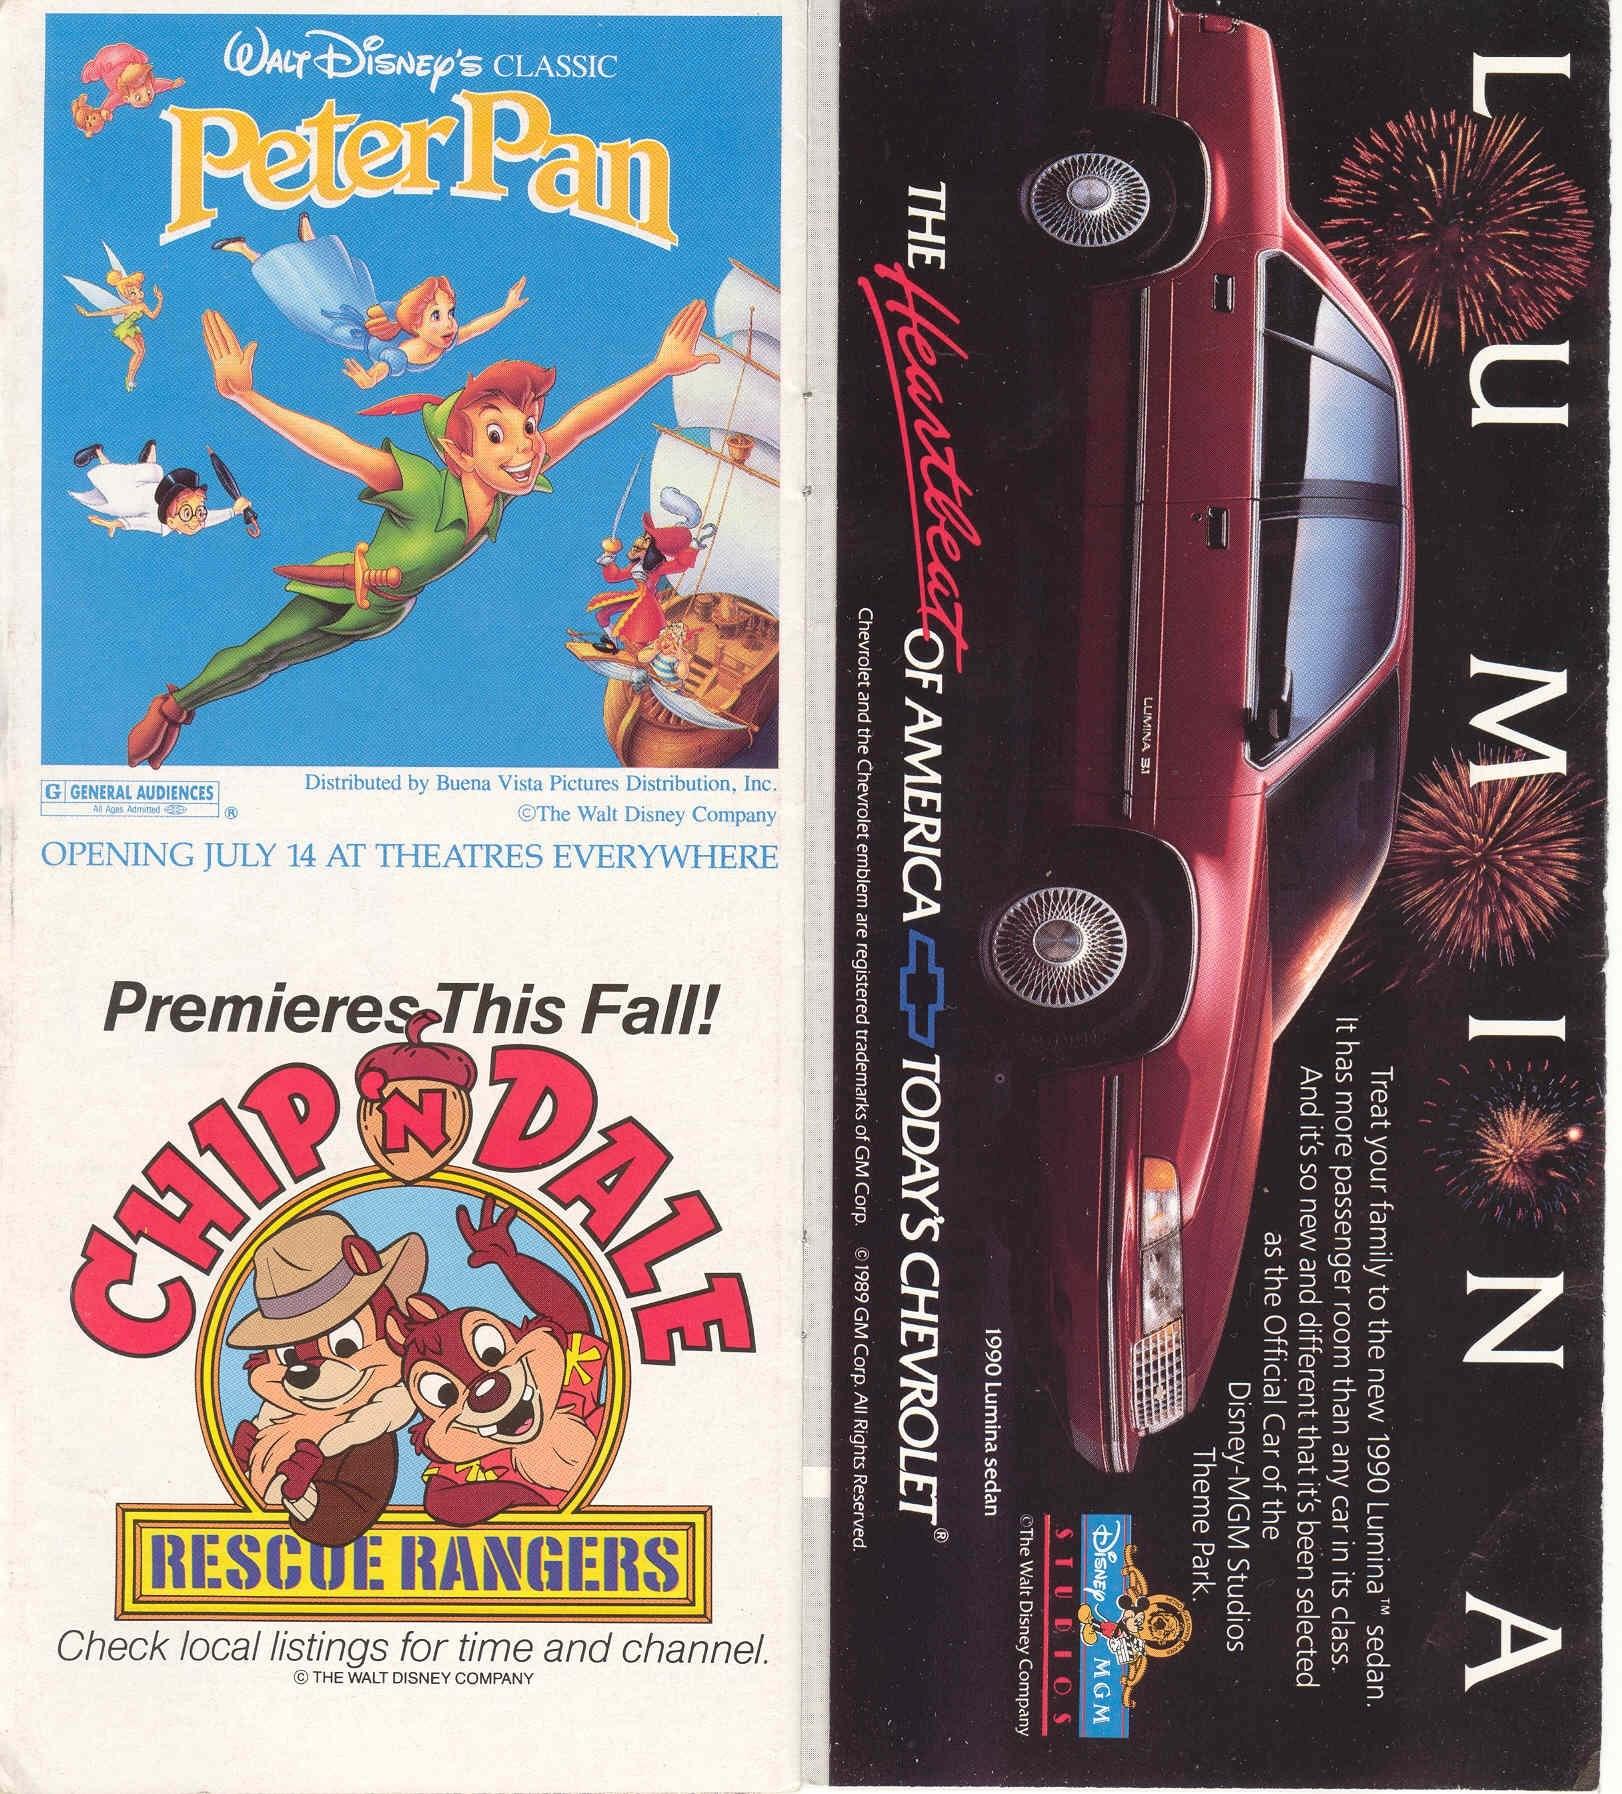 Disney-MGM Studios Guide Book 1989